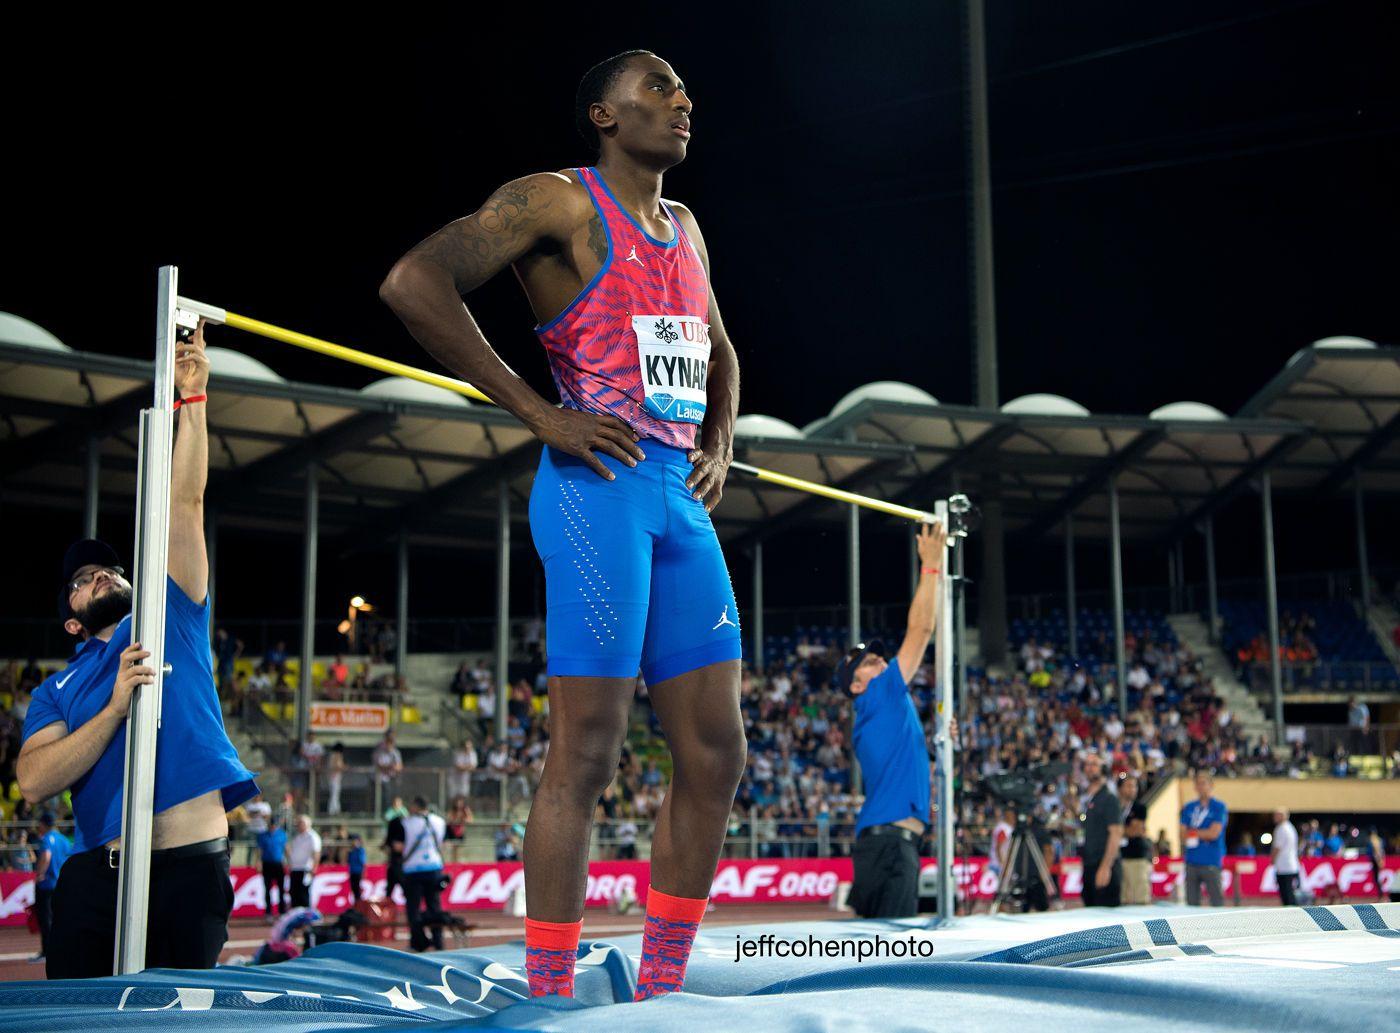 1r2016_athletissima_lausanne_kynard_hj_jeff_cohen_photo_281_web.jpg